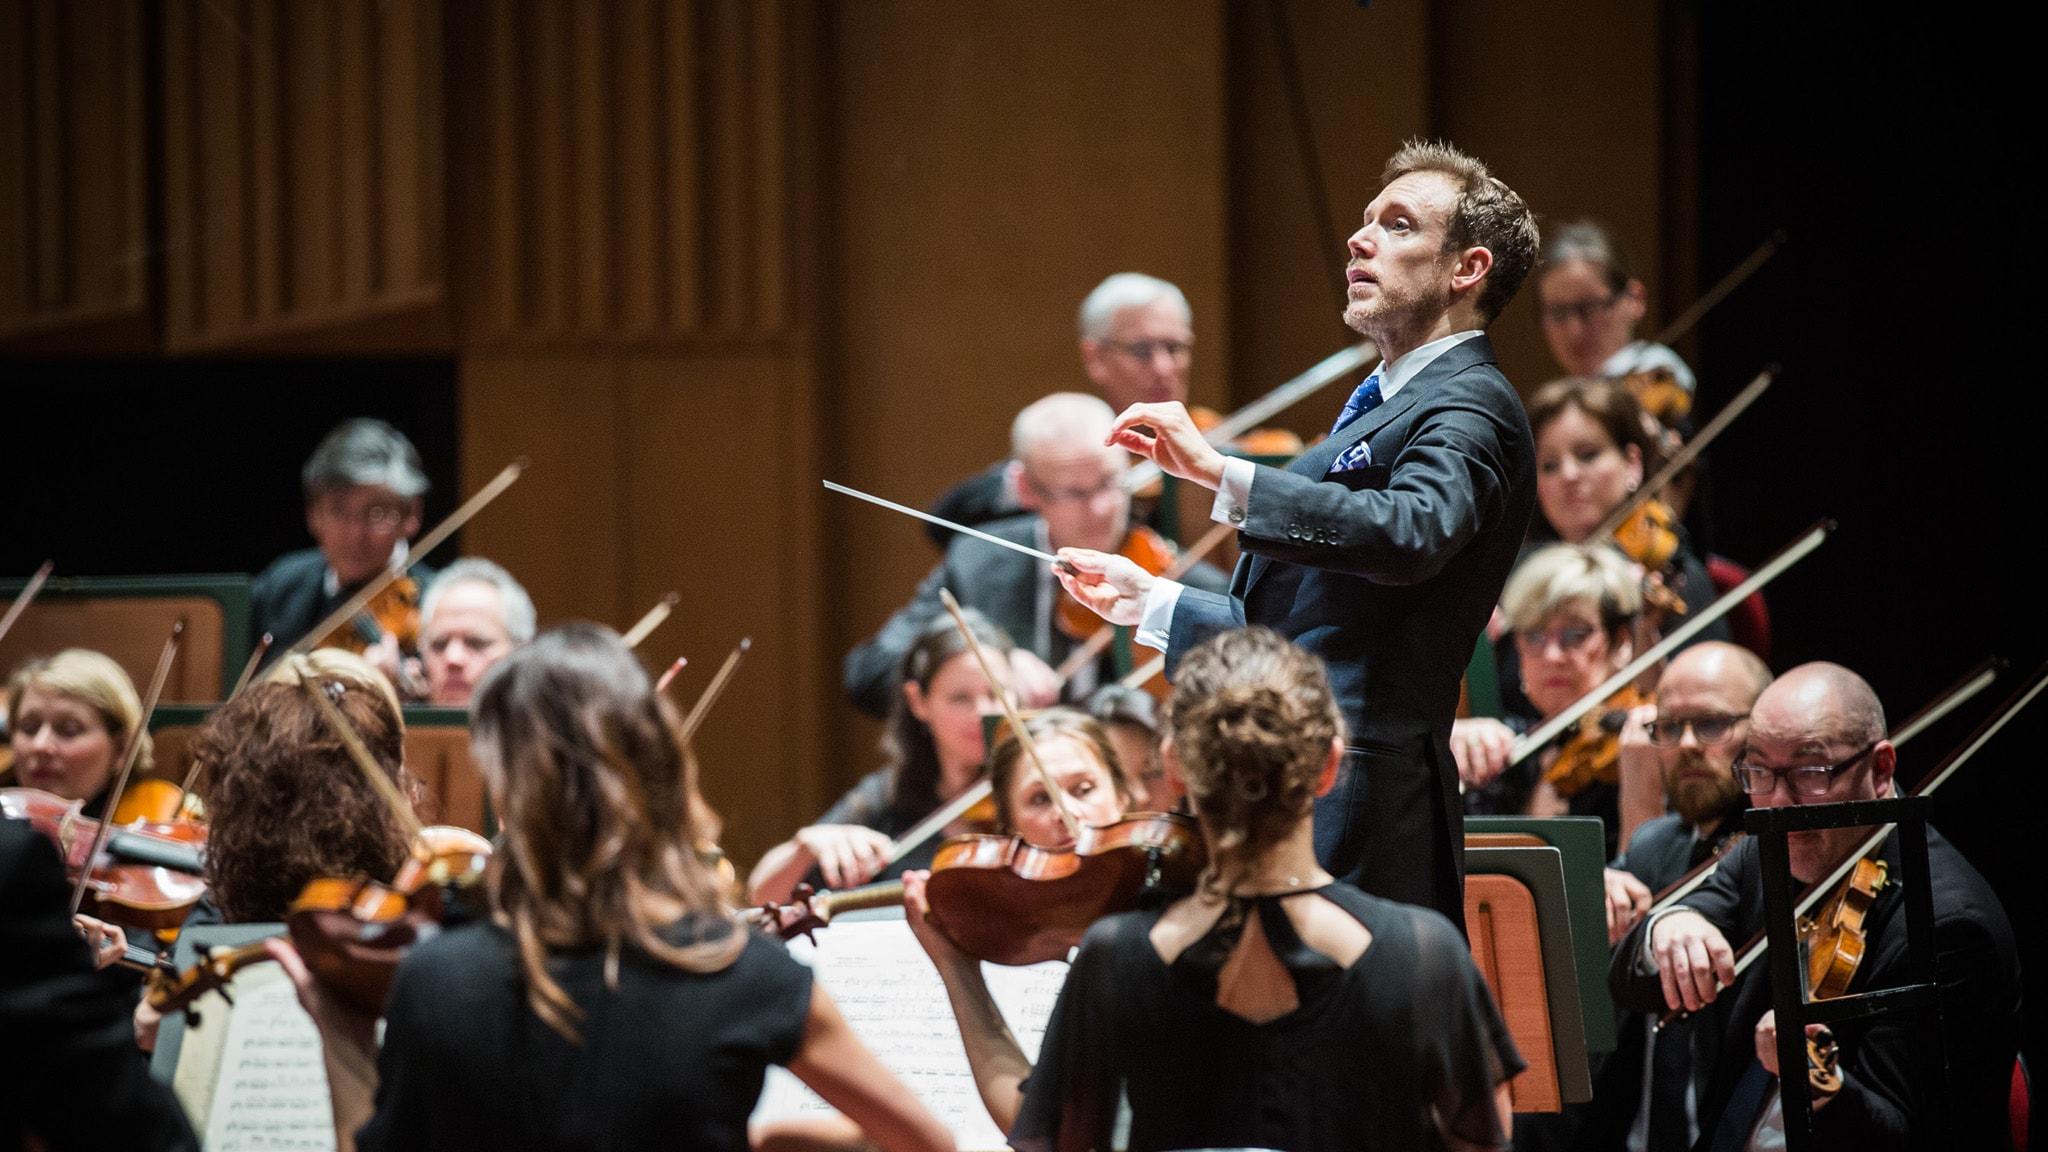 DIREKT: Mozarts Requiem från Berwaldhallen